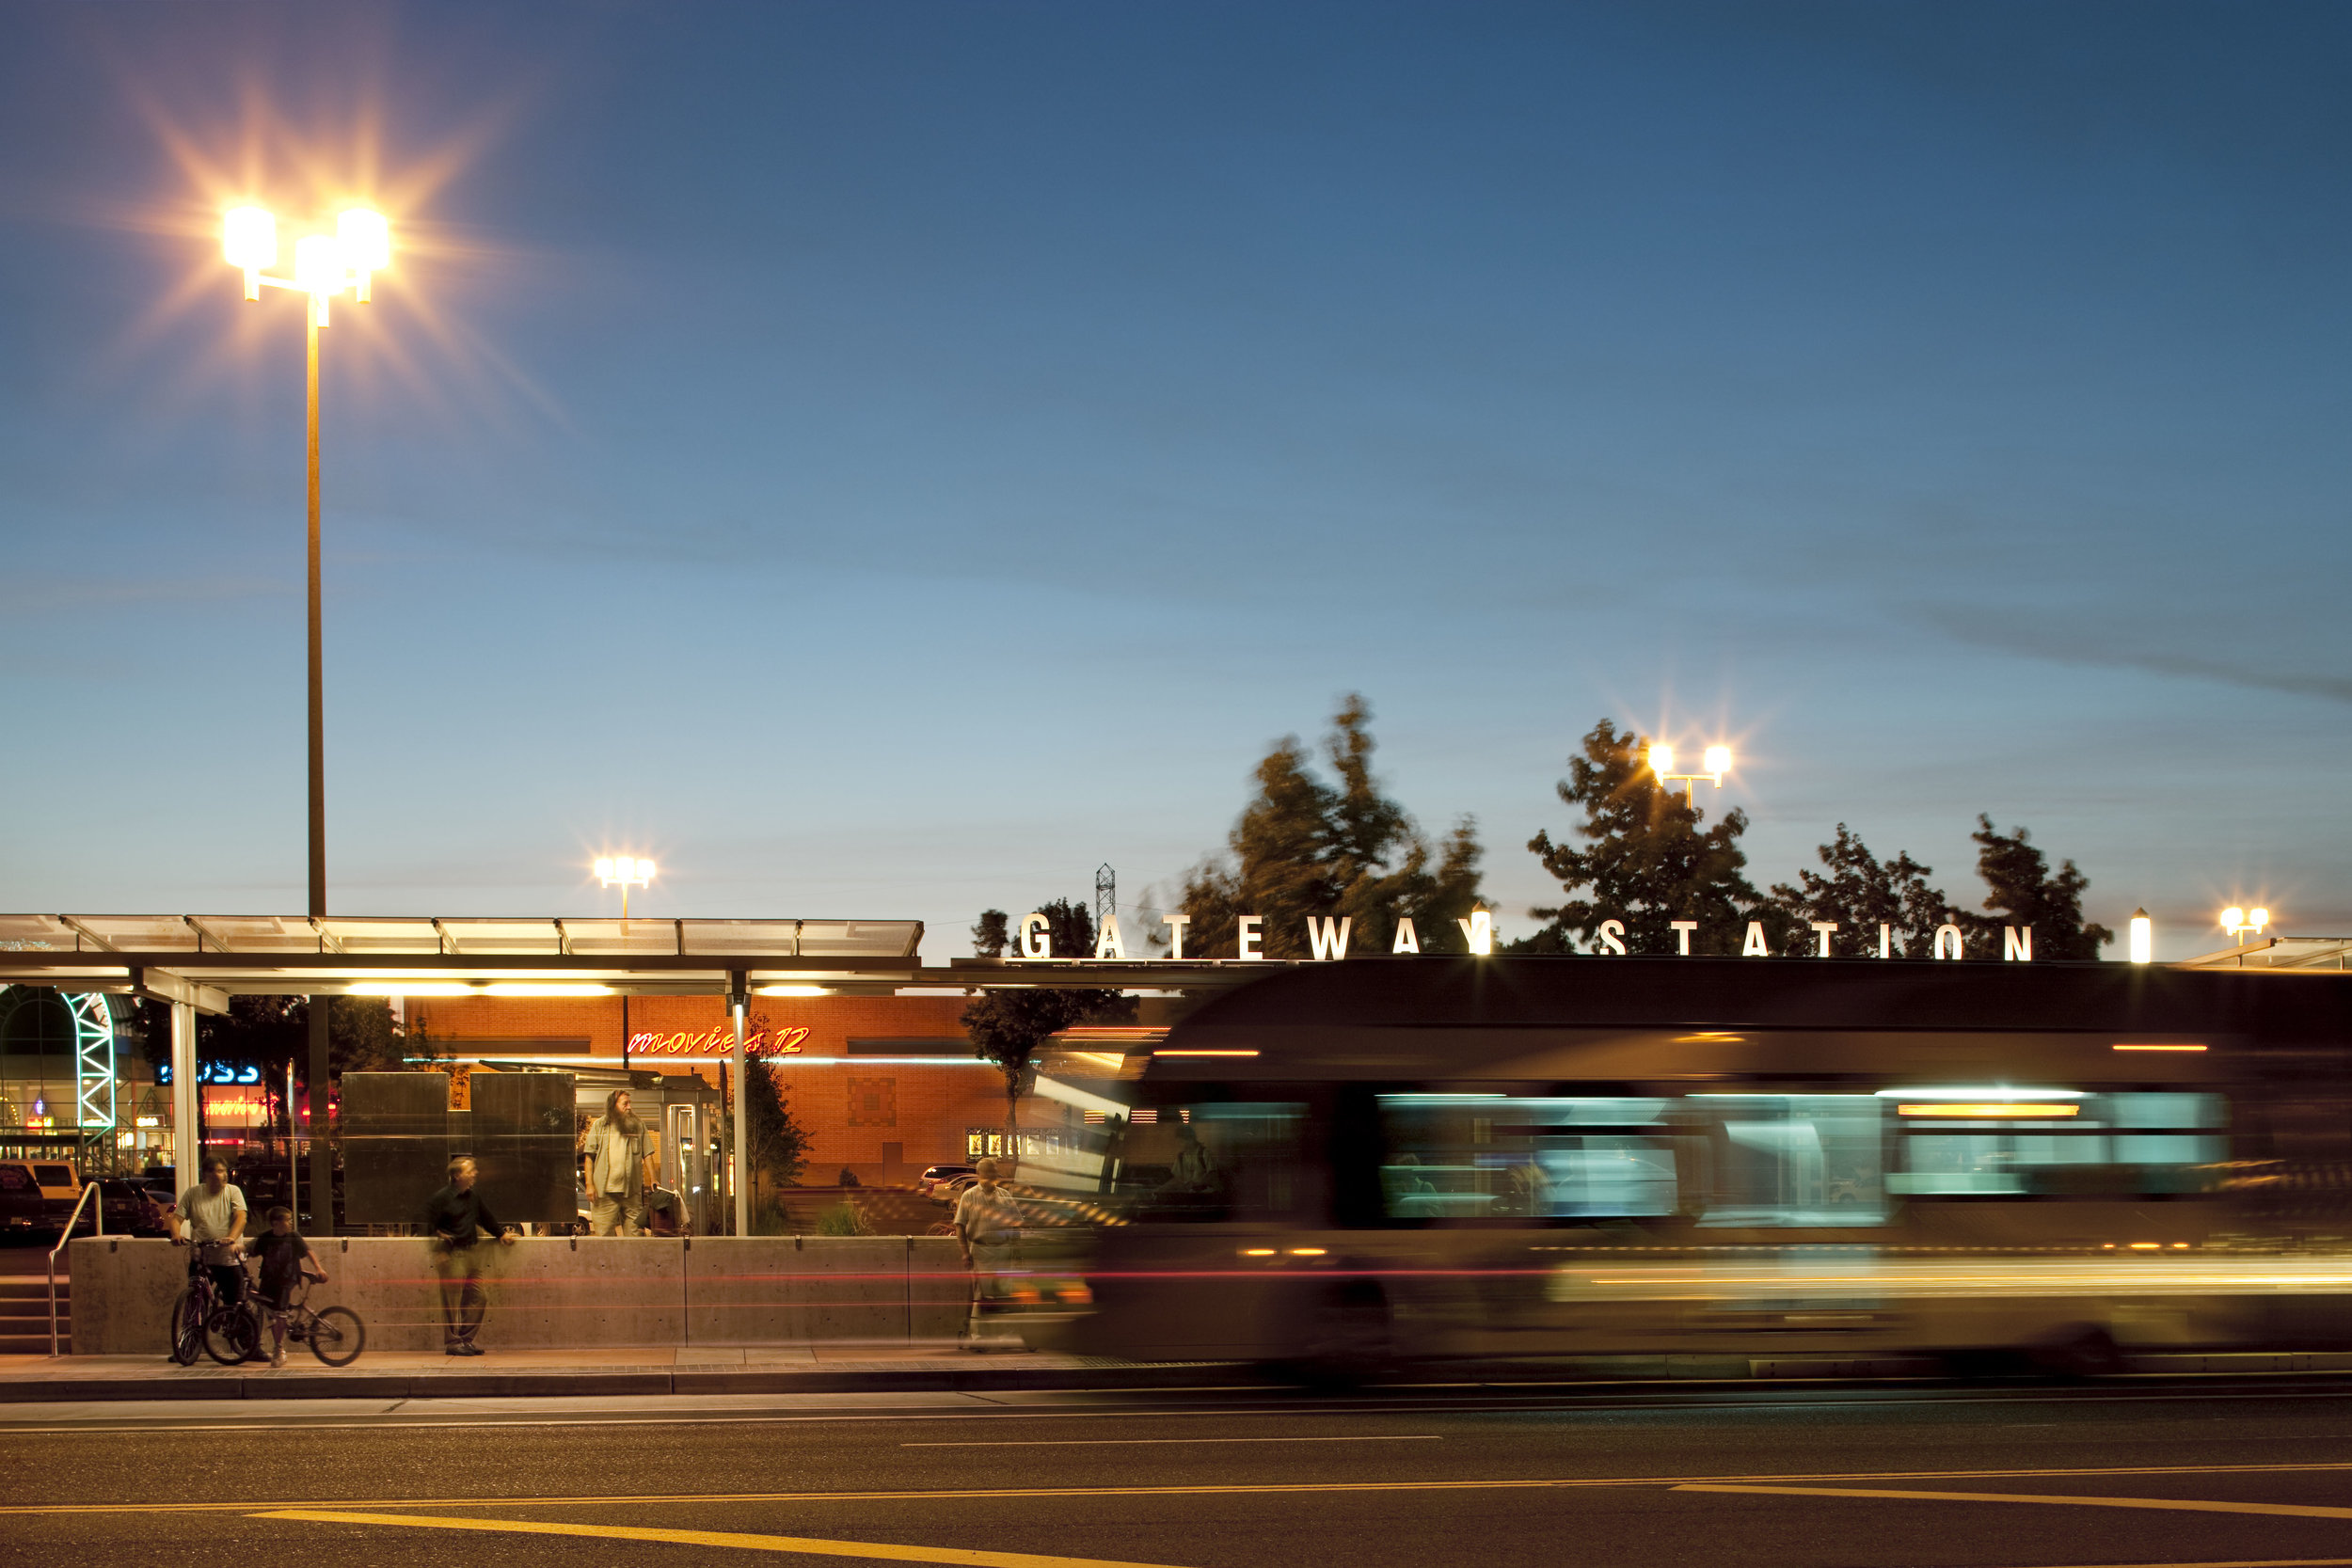 Lane Transit District Gateway Station